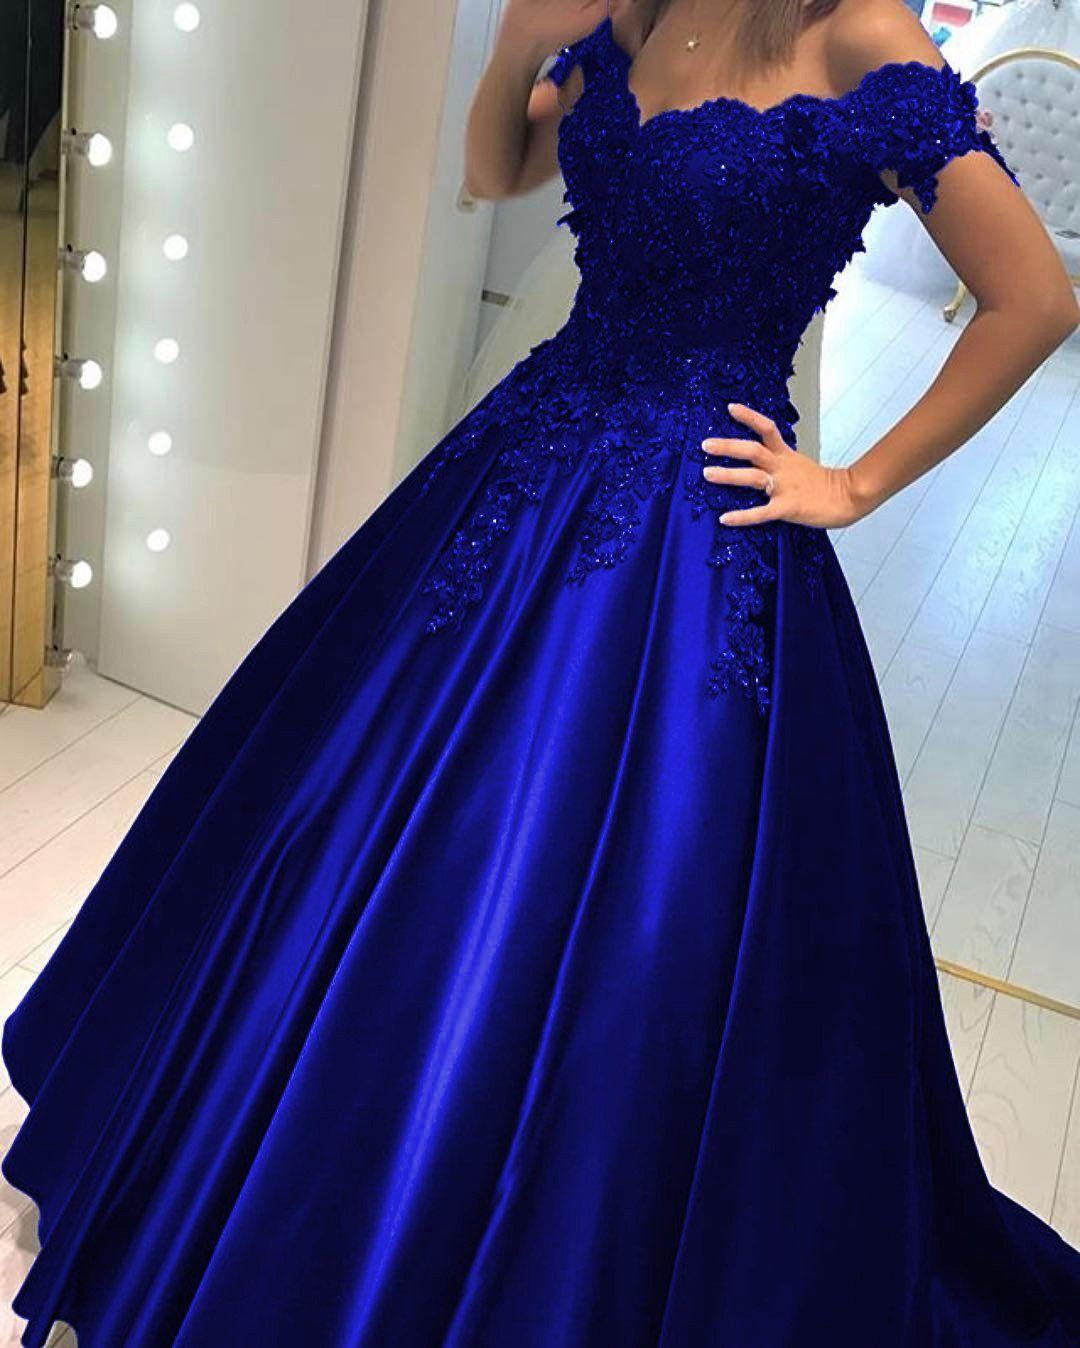 2578672af8 Lace Flower Off The Shoulder Satin Prom Dresses Ball Gowns